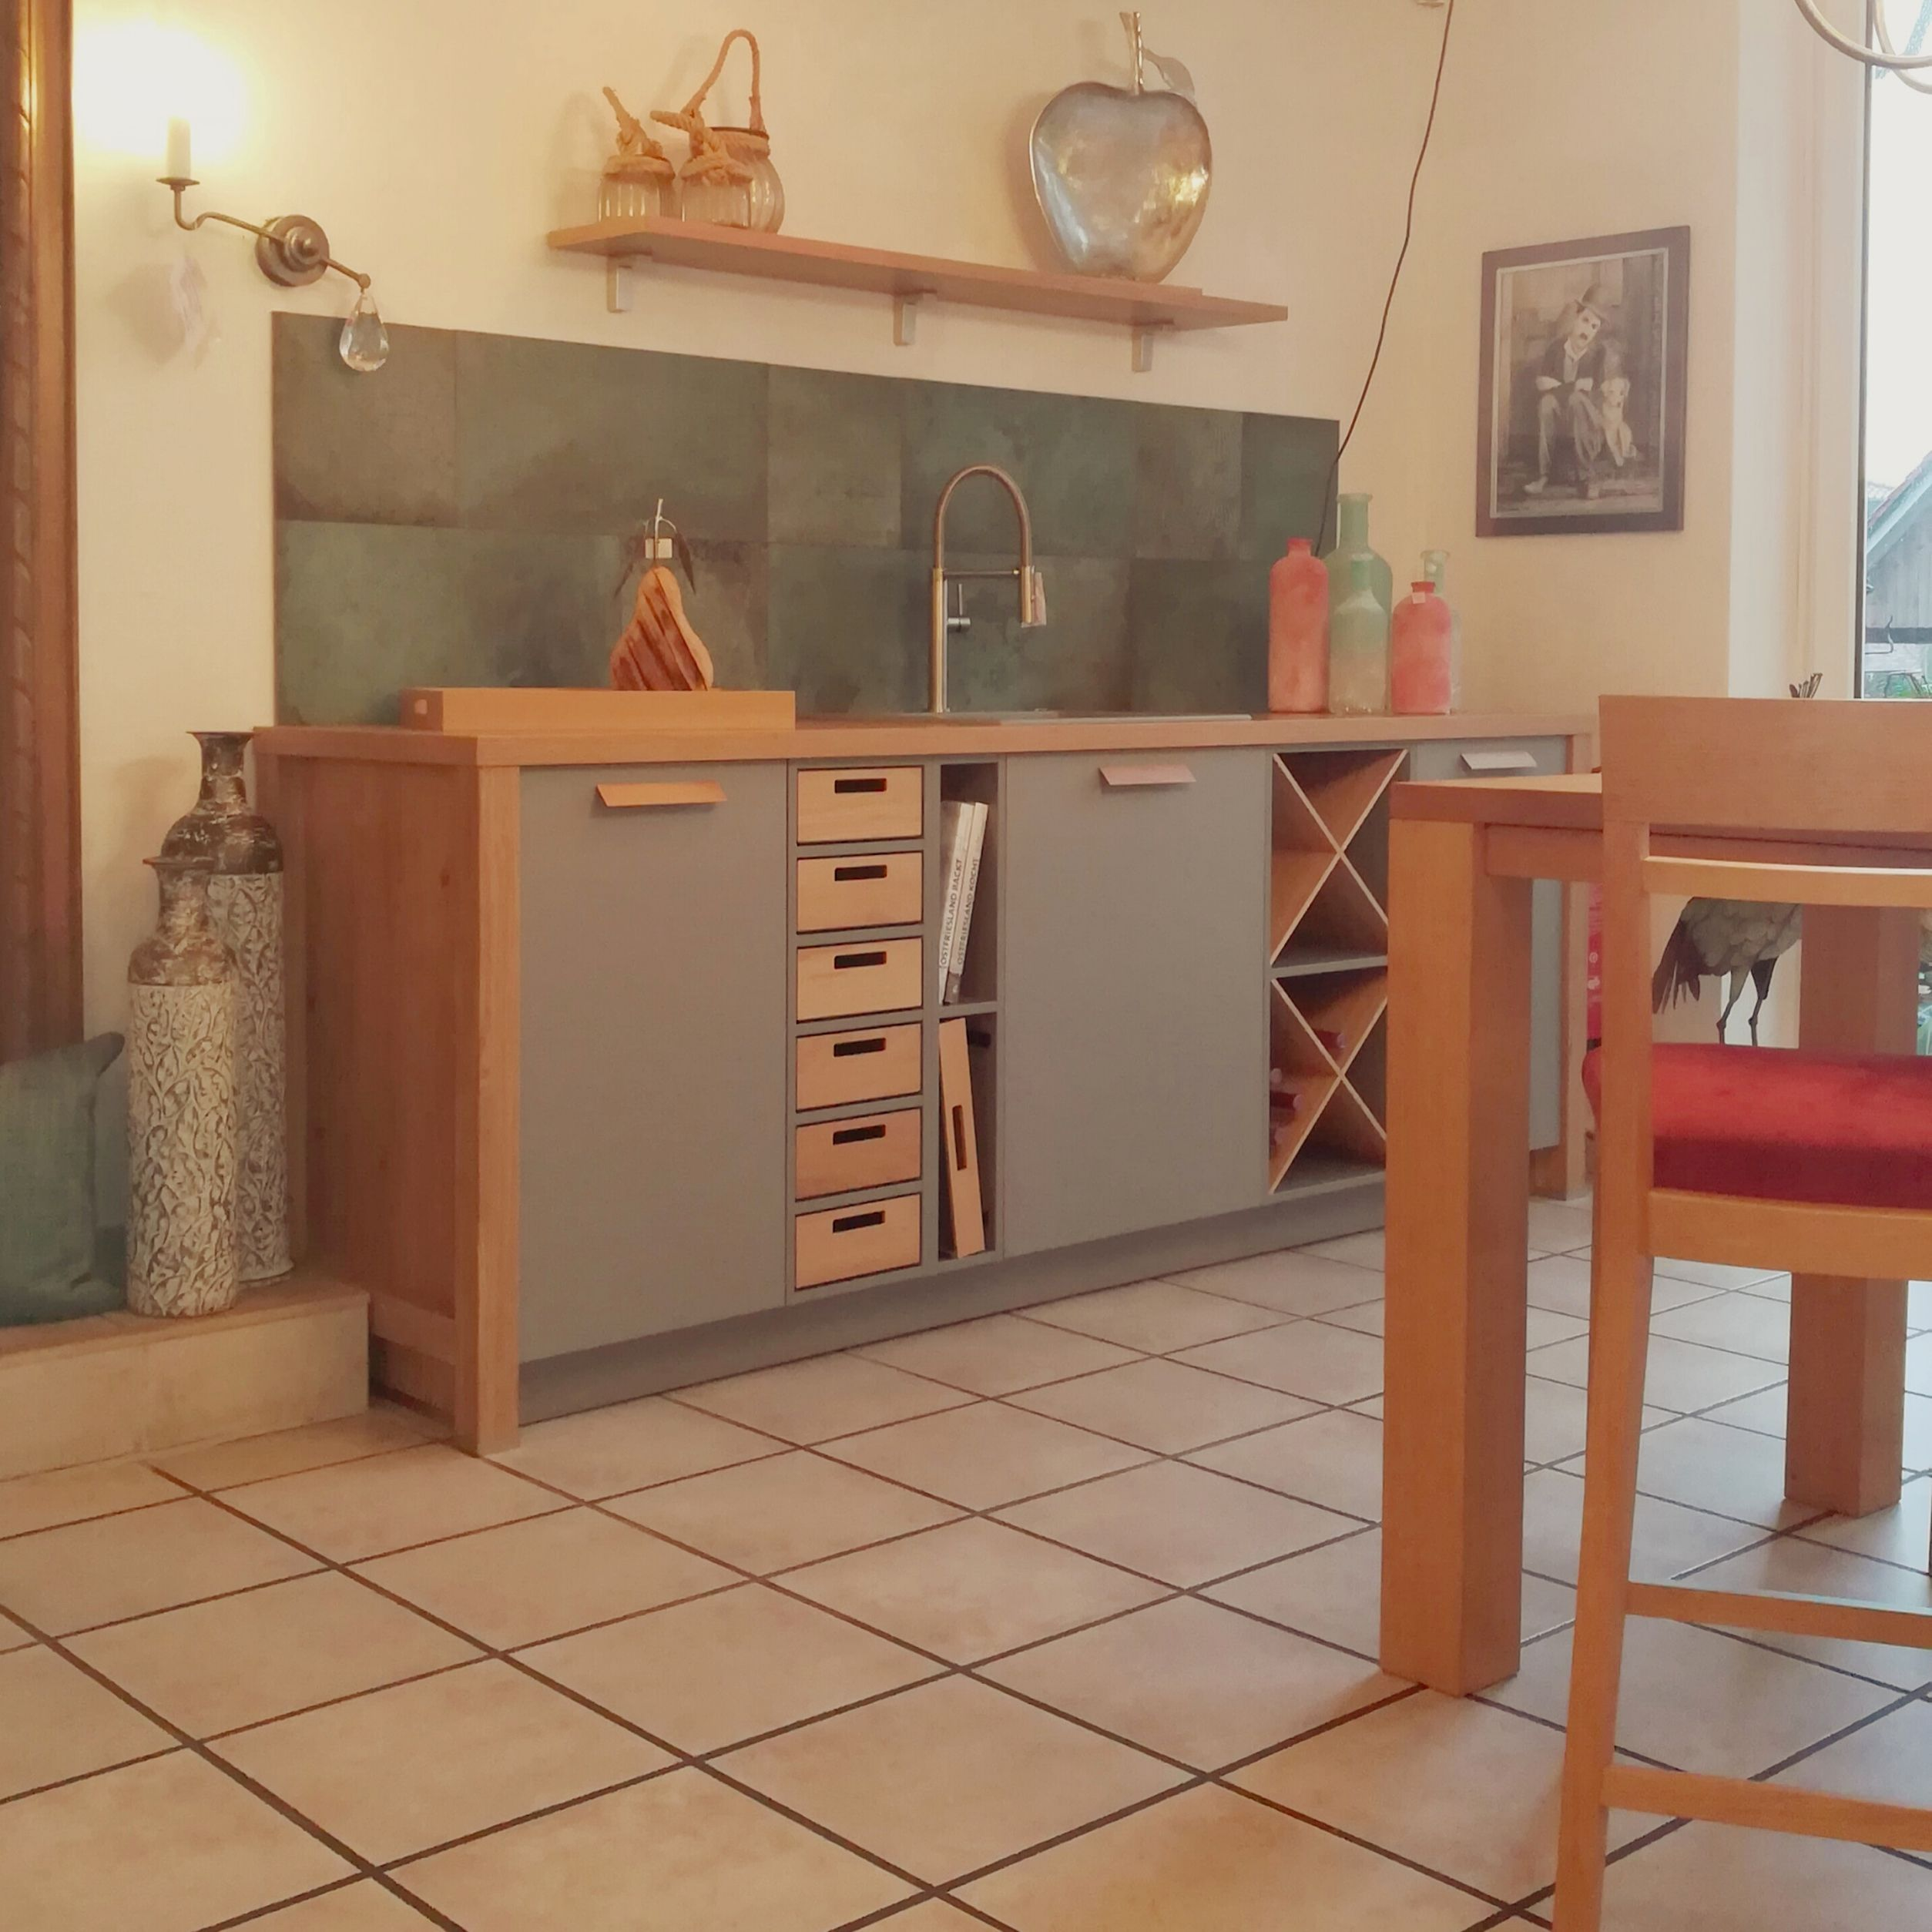 Küchen-Atelier Inh. Inga Streithorst